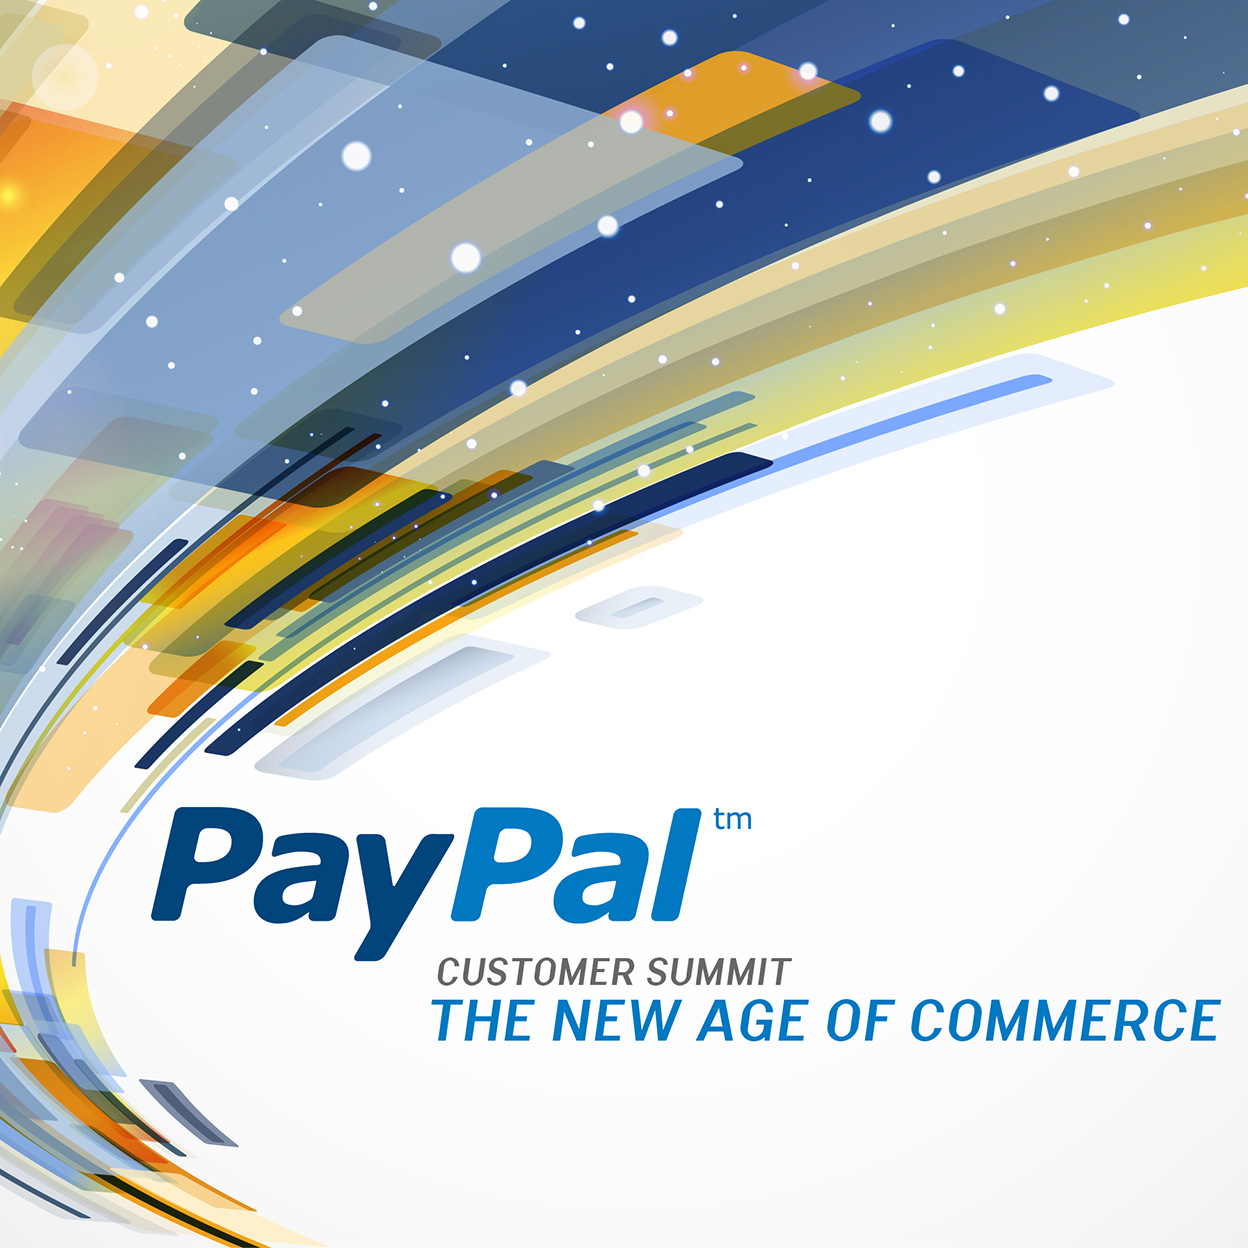 PayPal: Customer Summit – Program of Events